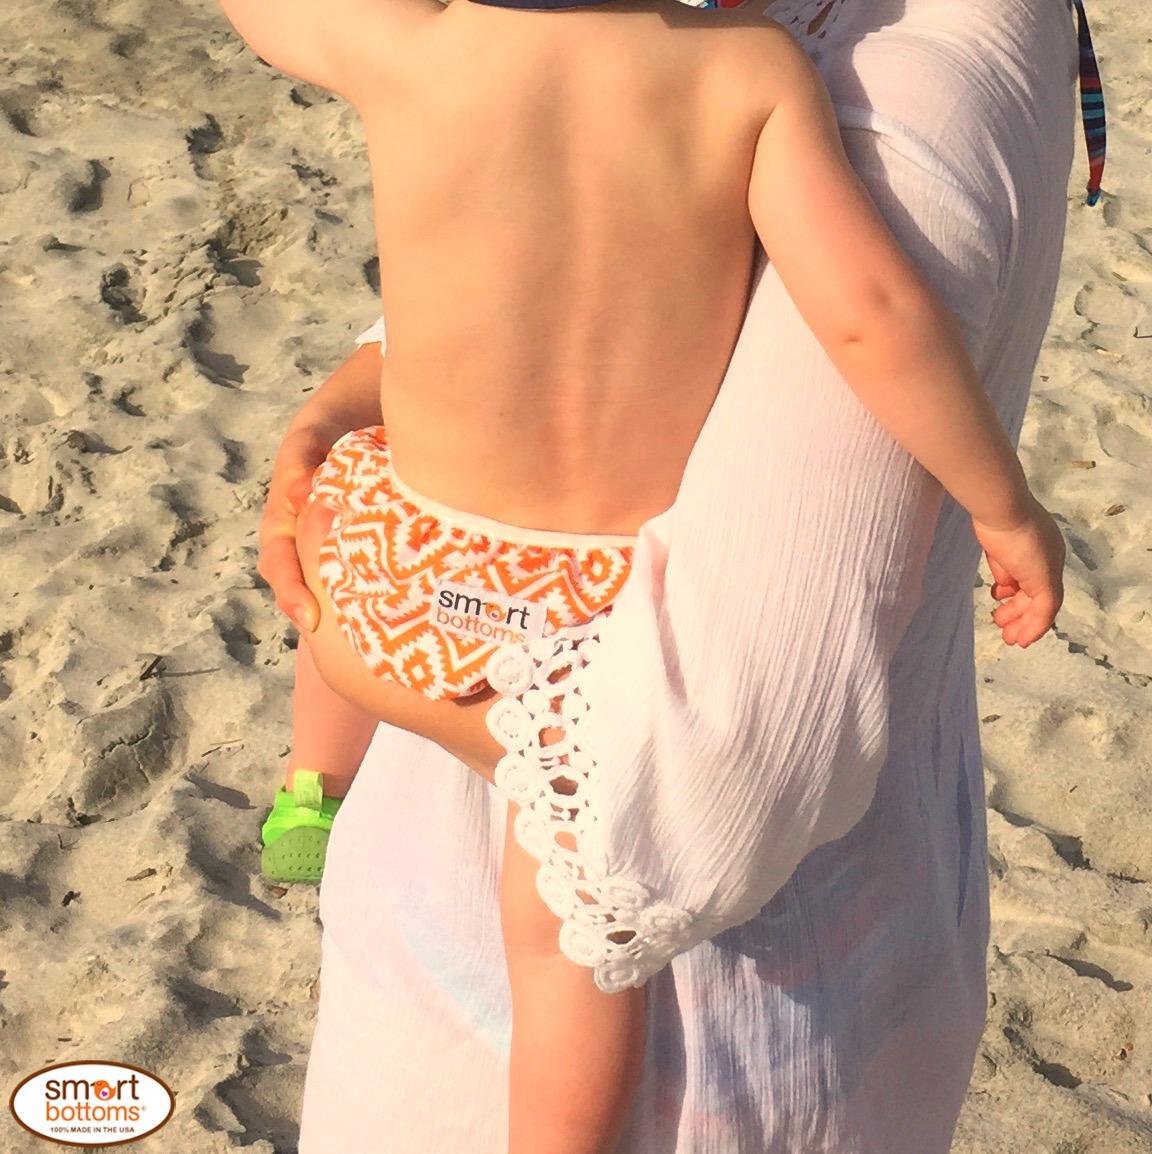 Smart Bottoms Swim Diaper orange and white aztec print Eduardo